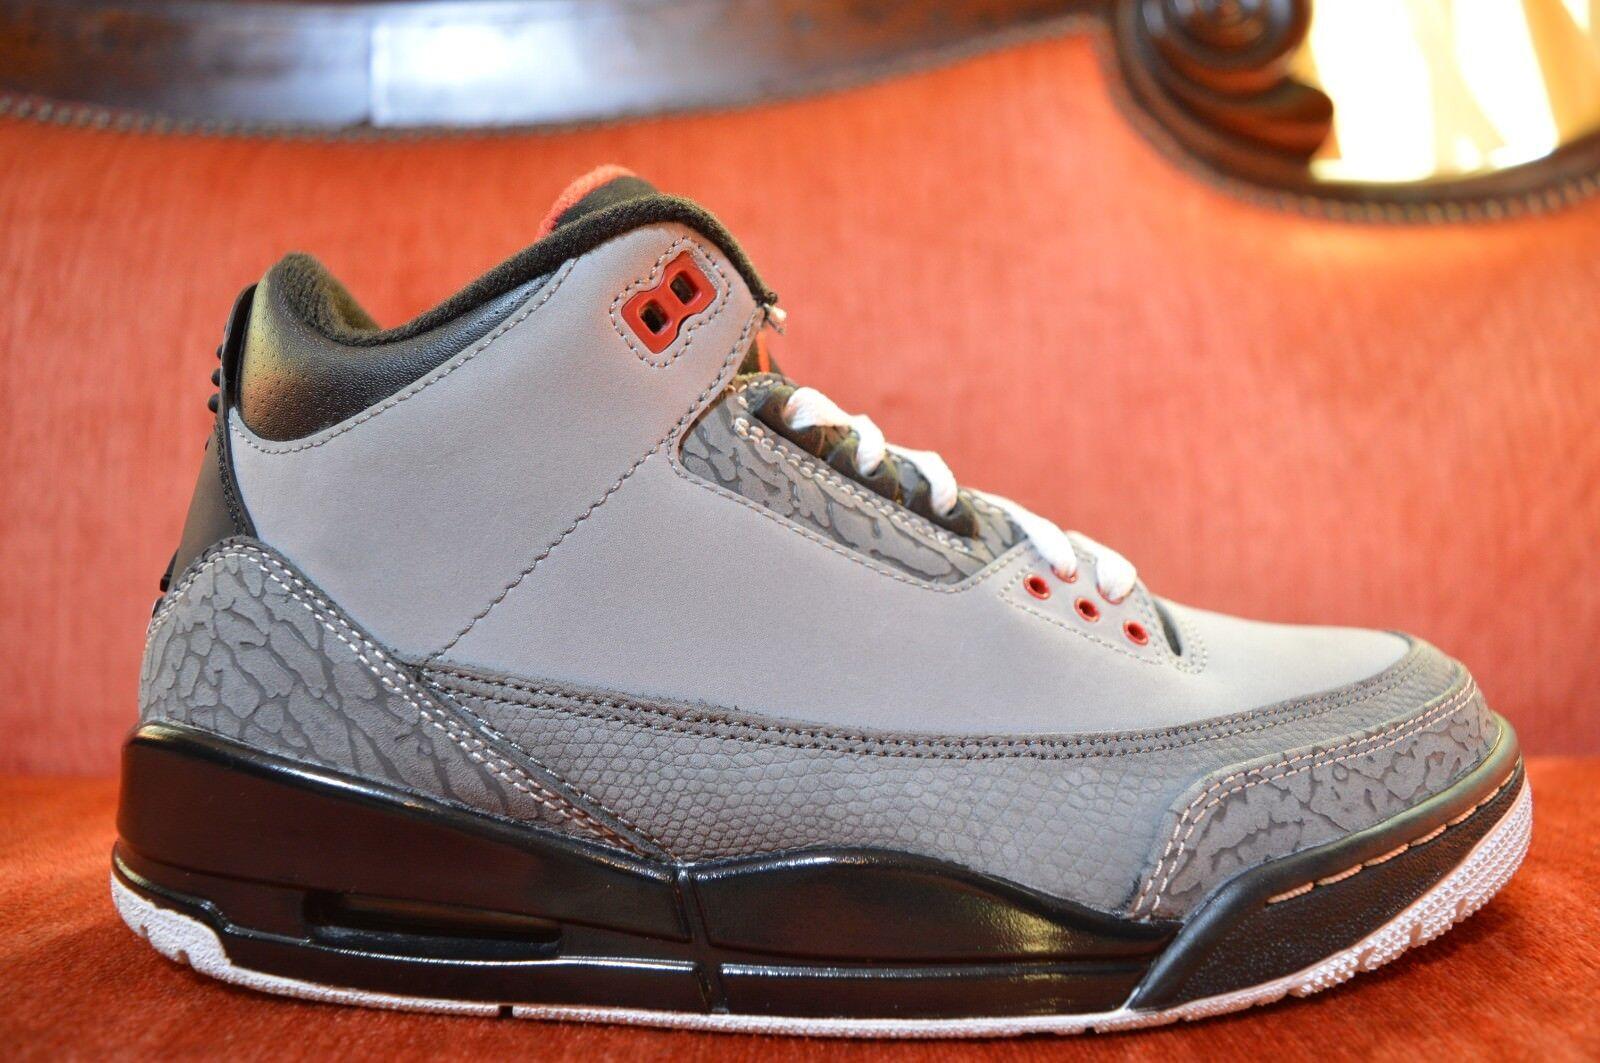 WORN 2X Nike Air Jordan 3 III Retro Stealth Cool Grey Black 136064-003 Size 7.5